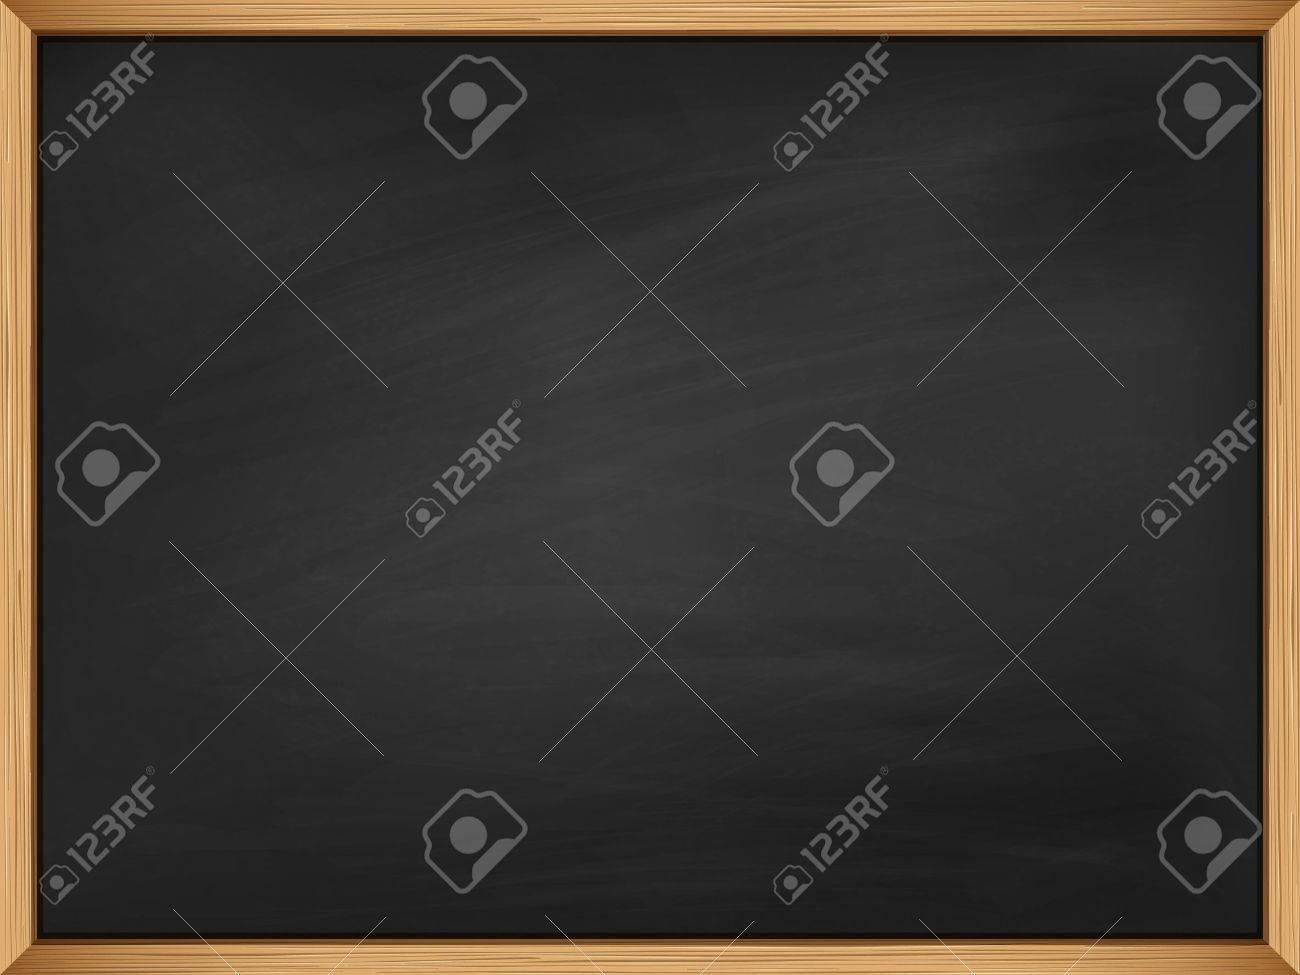 Empty blackboard with wooden frame. - 37248560